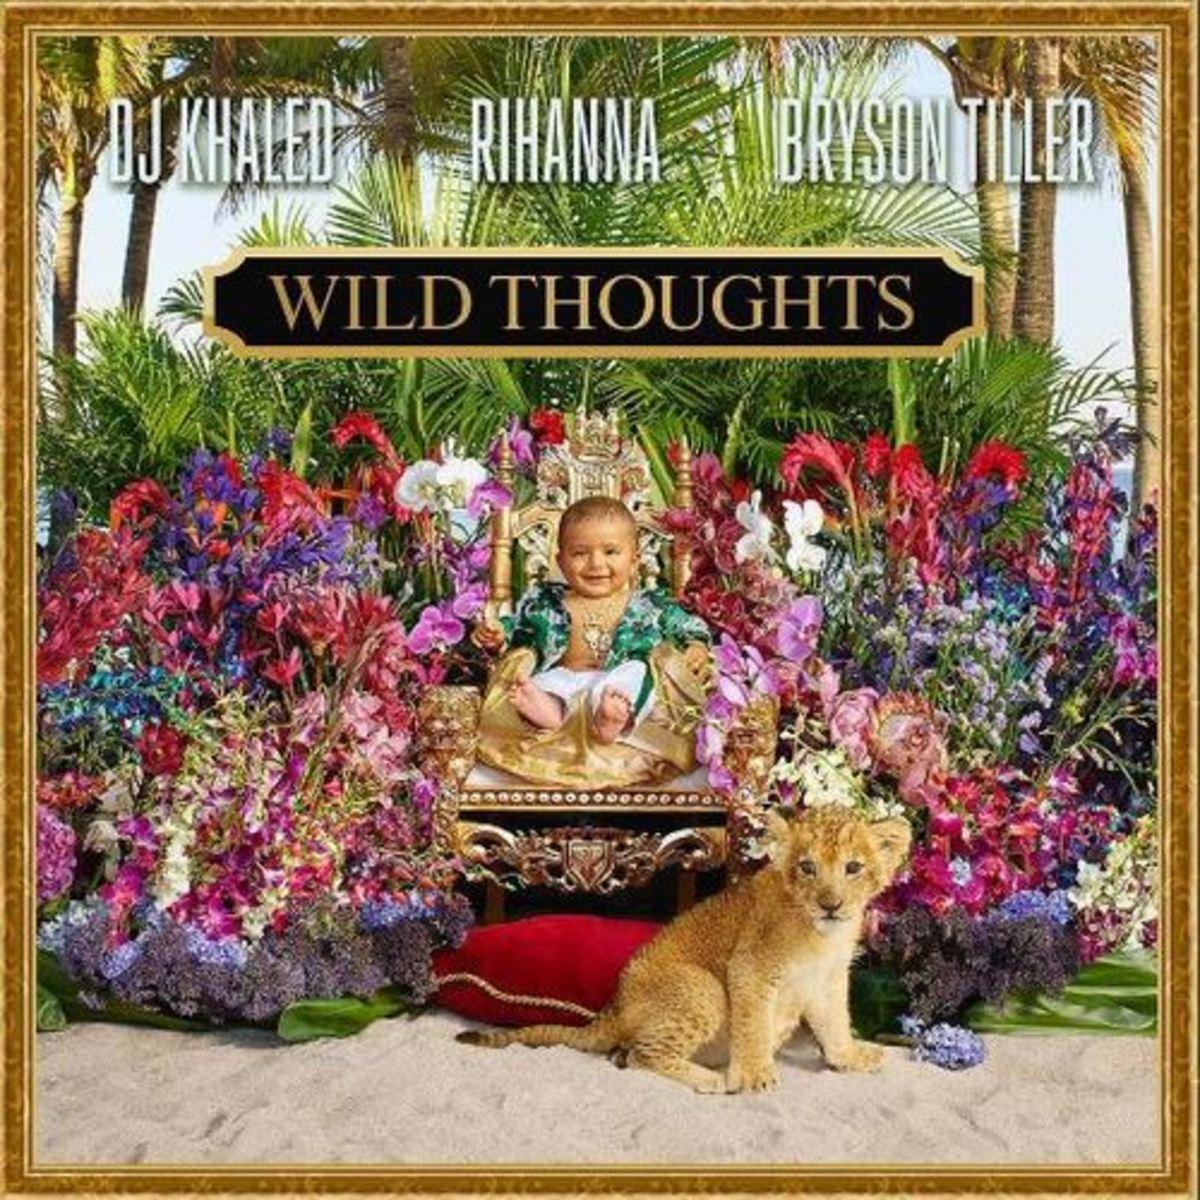 dj-khaled-wild-thoughts.jpg